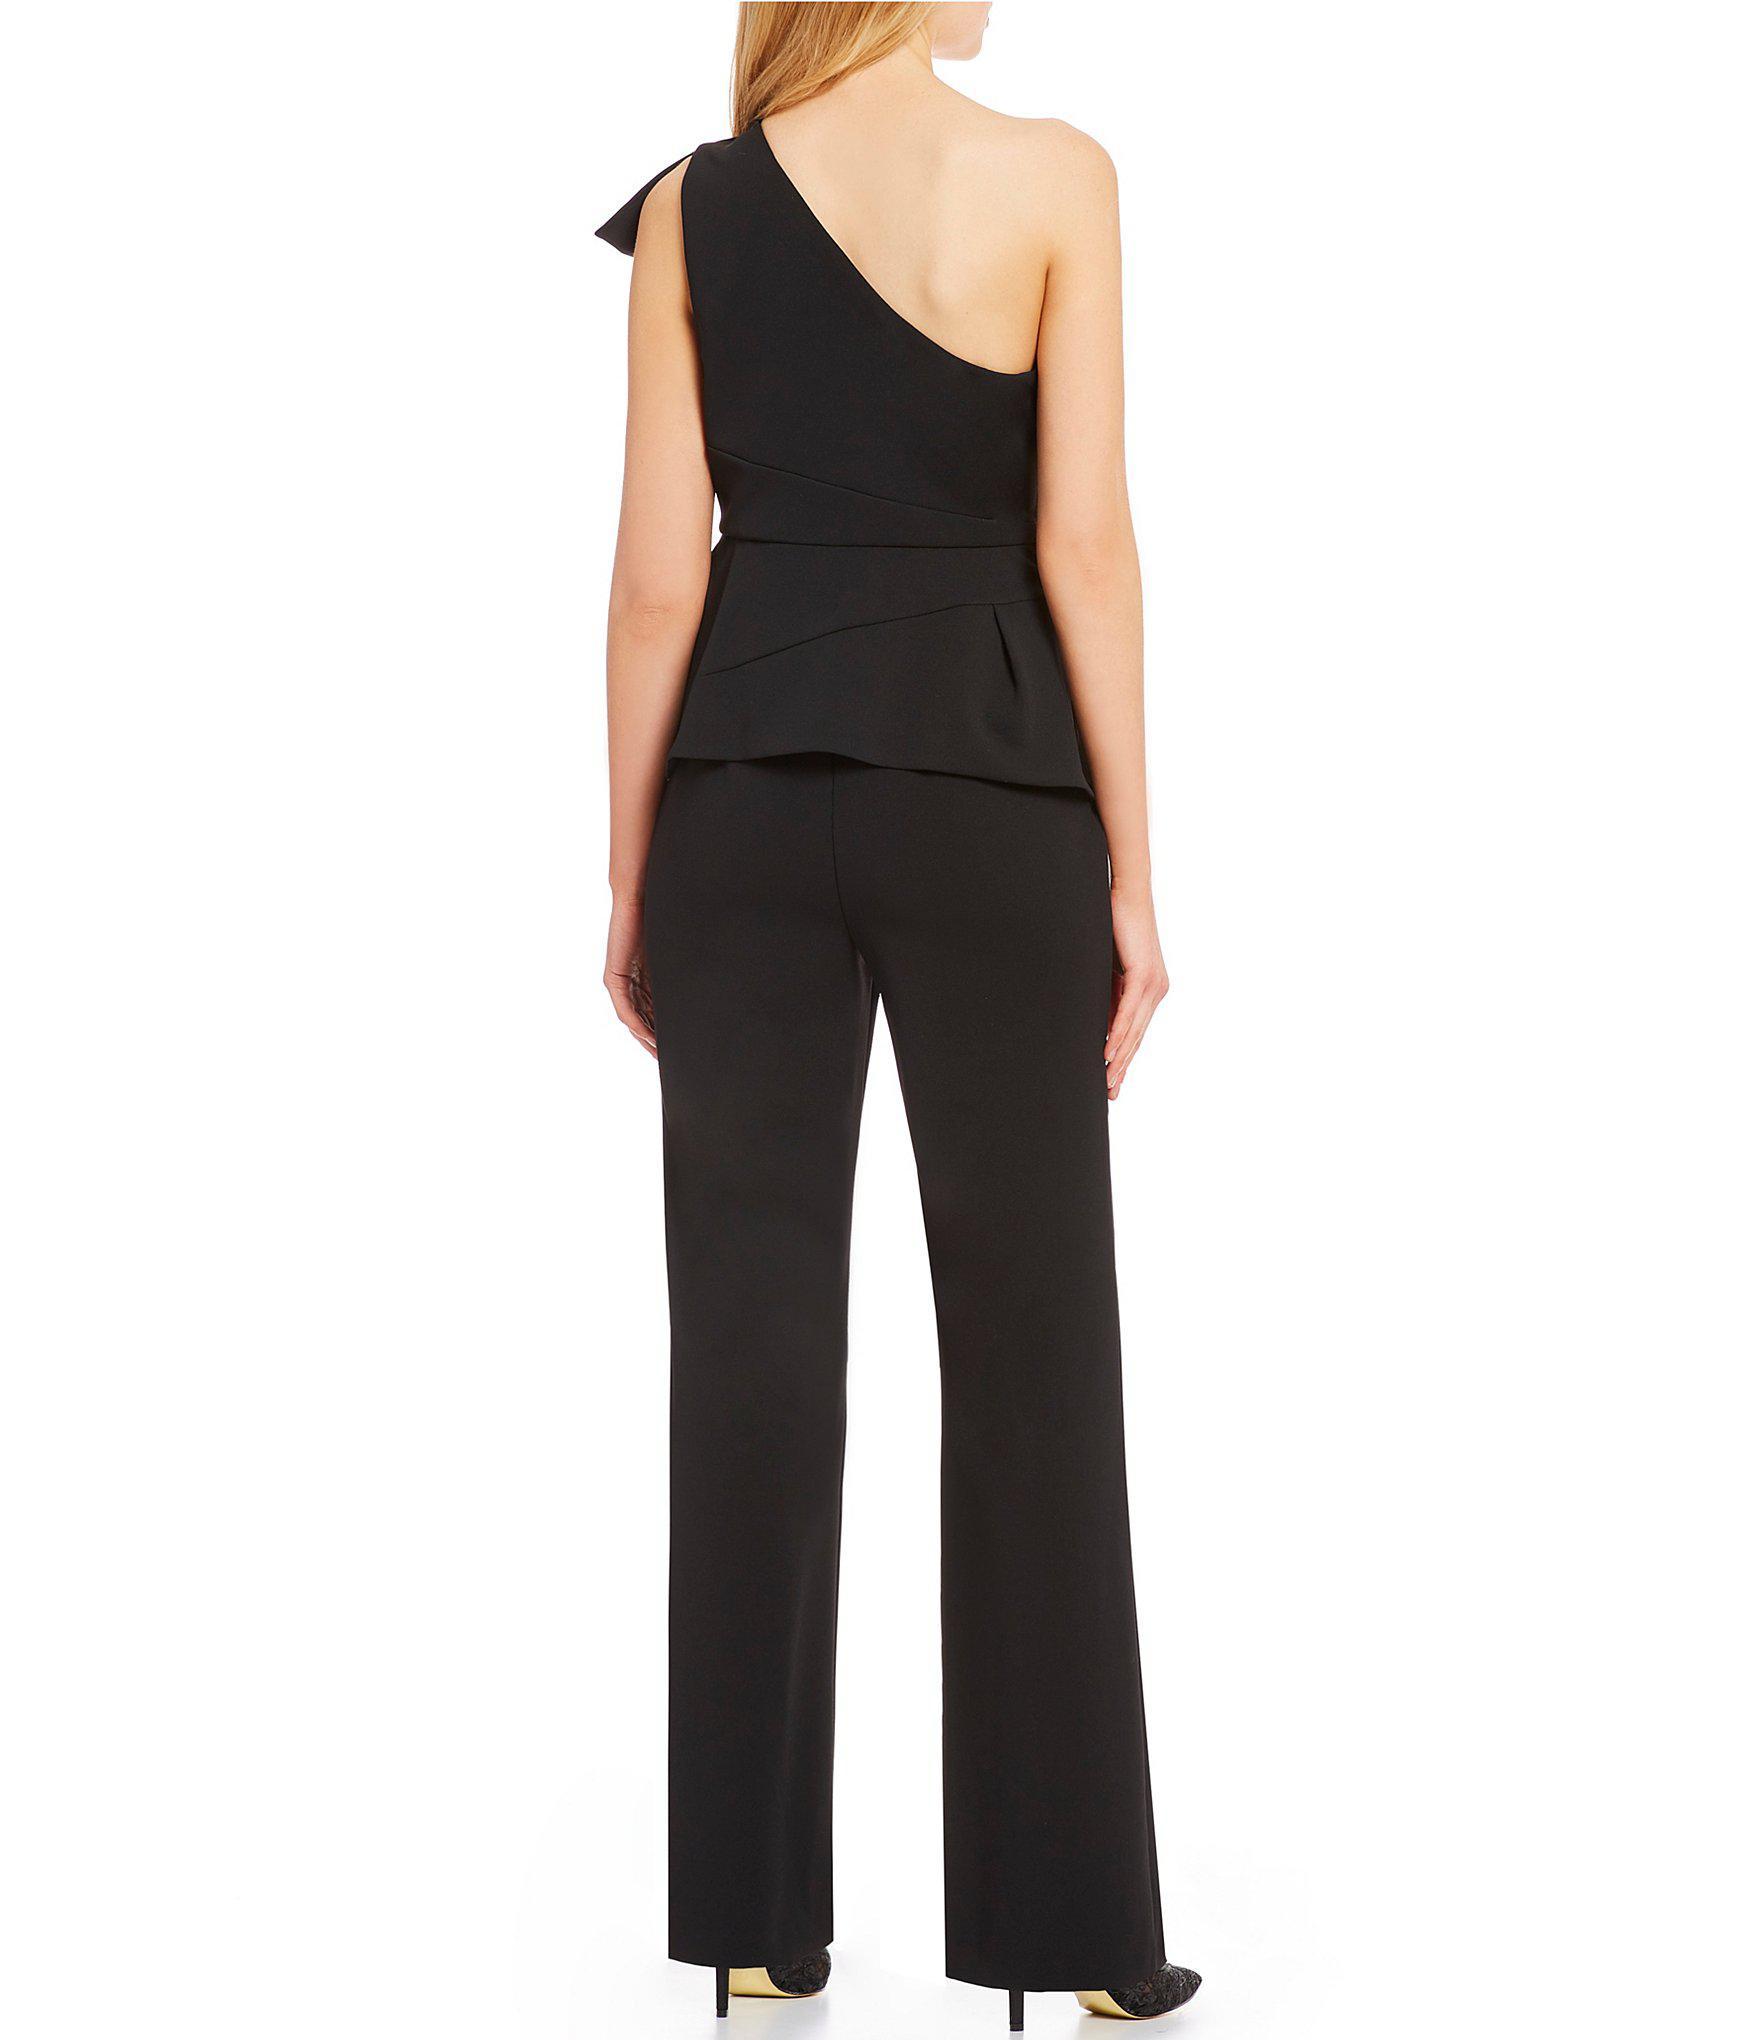 f0dc8d5618e3 Adrianna Papell - Black Petite Size One Shoulder Ruffle Jumpsuit - Lyst.  View fullscreen